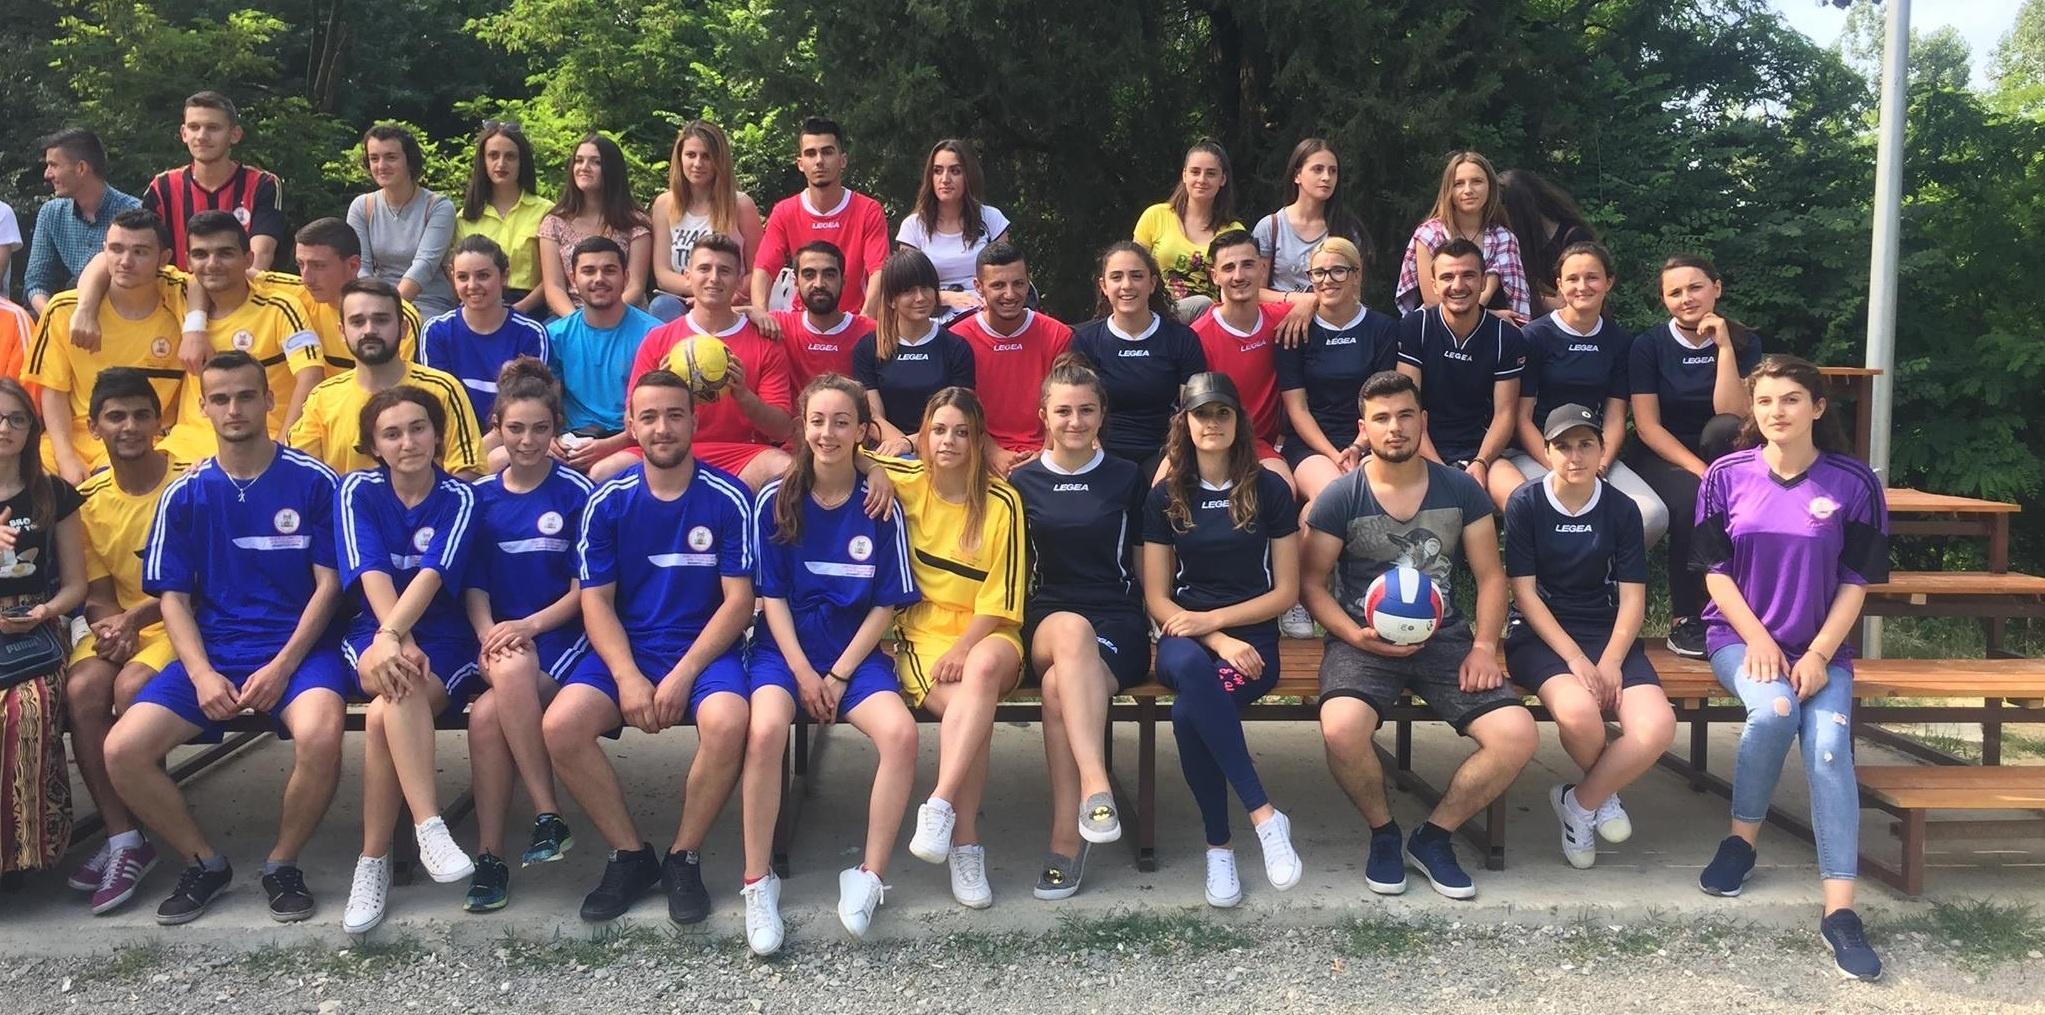 Kampionati i Minifutbollit dhe i Volejbollit